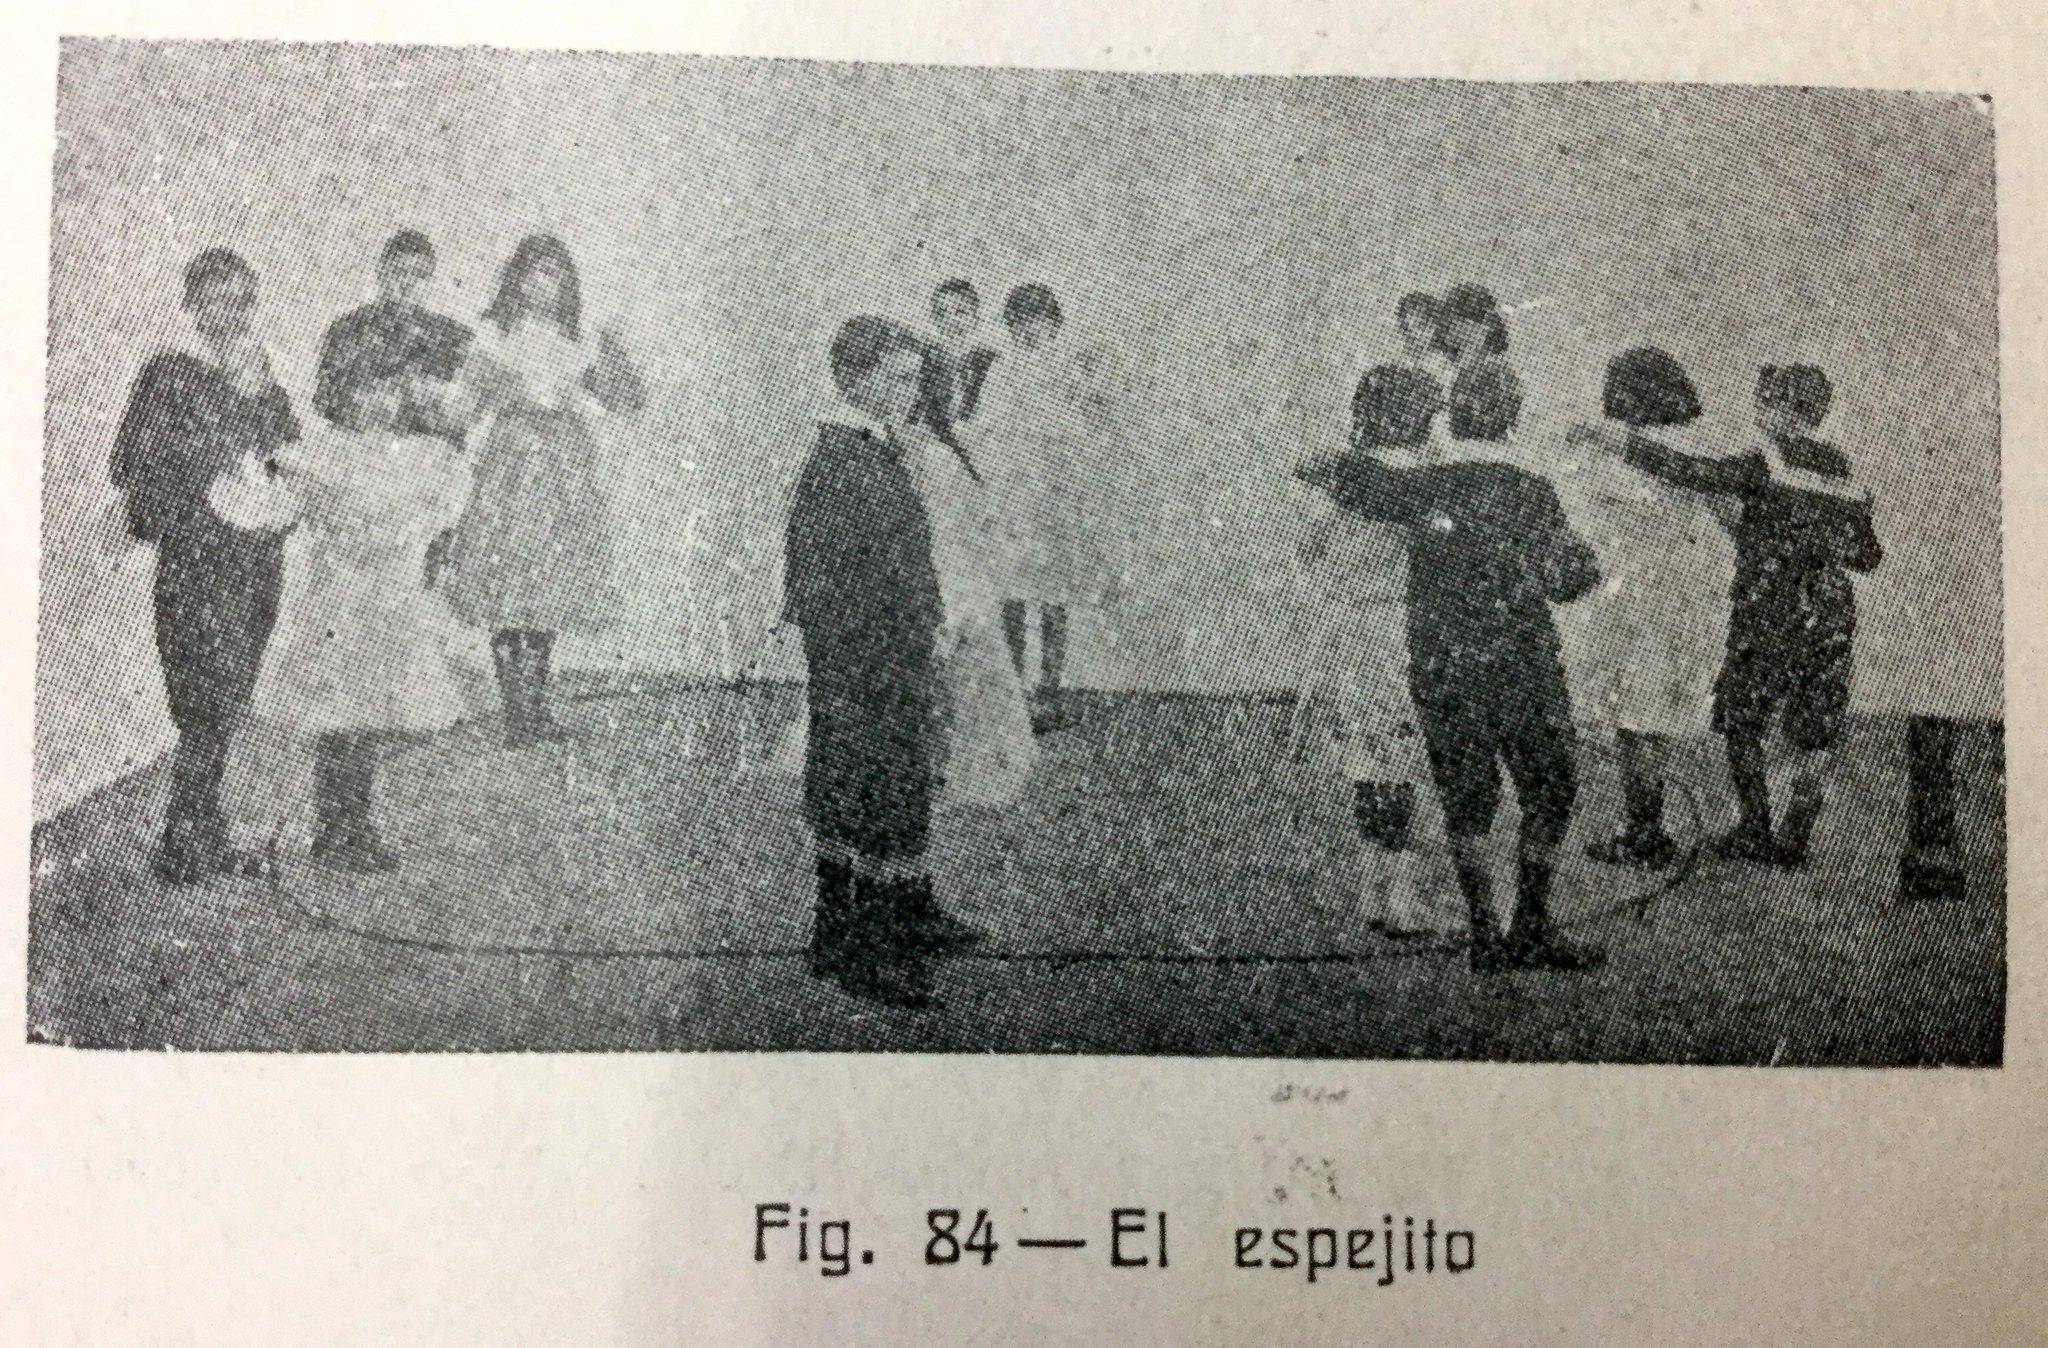 Imágenes históricas del pericón – Tesis Analía Fontán